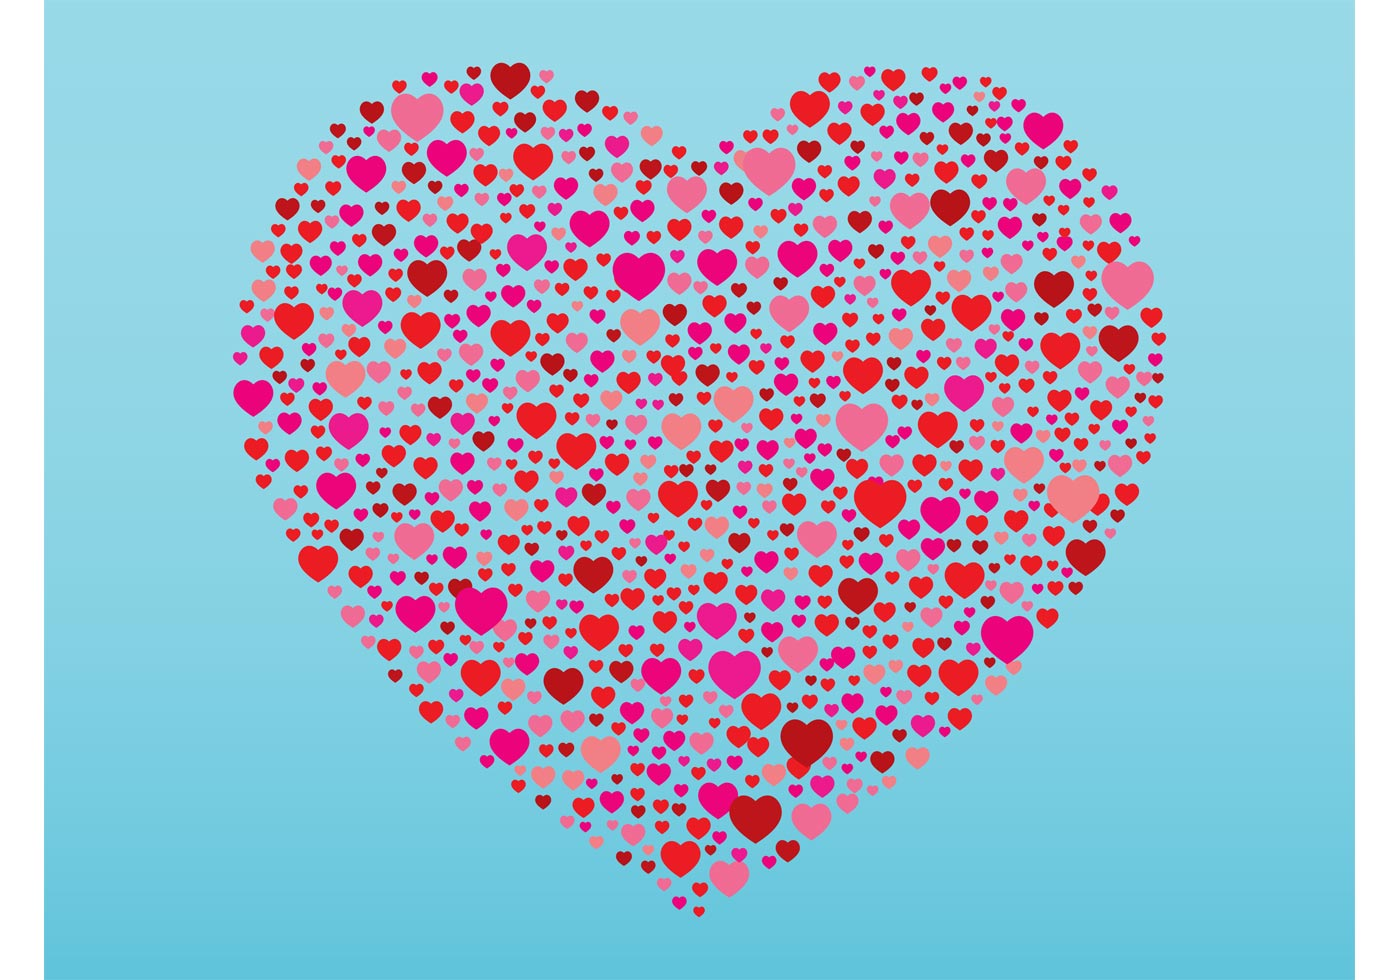 Heart Shapes Free Vector Art